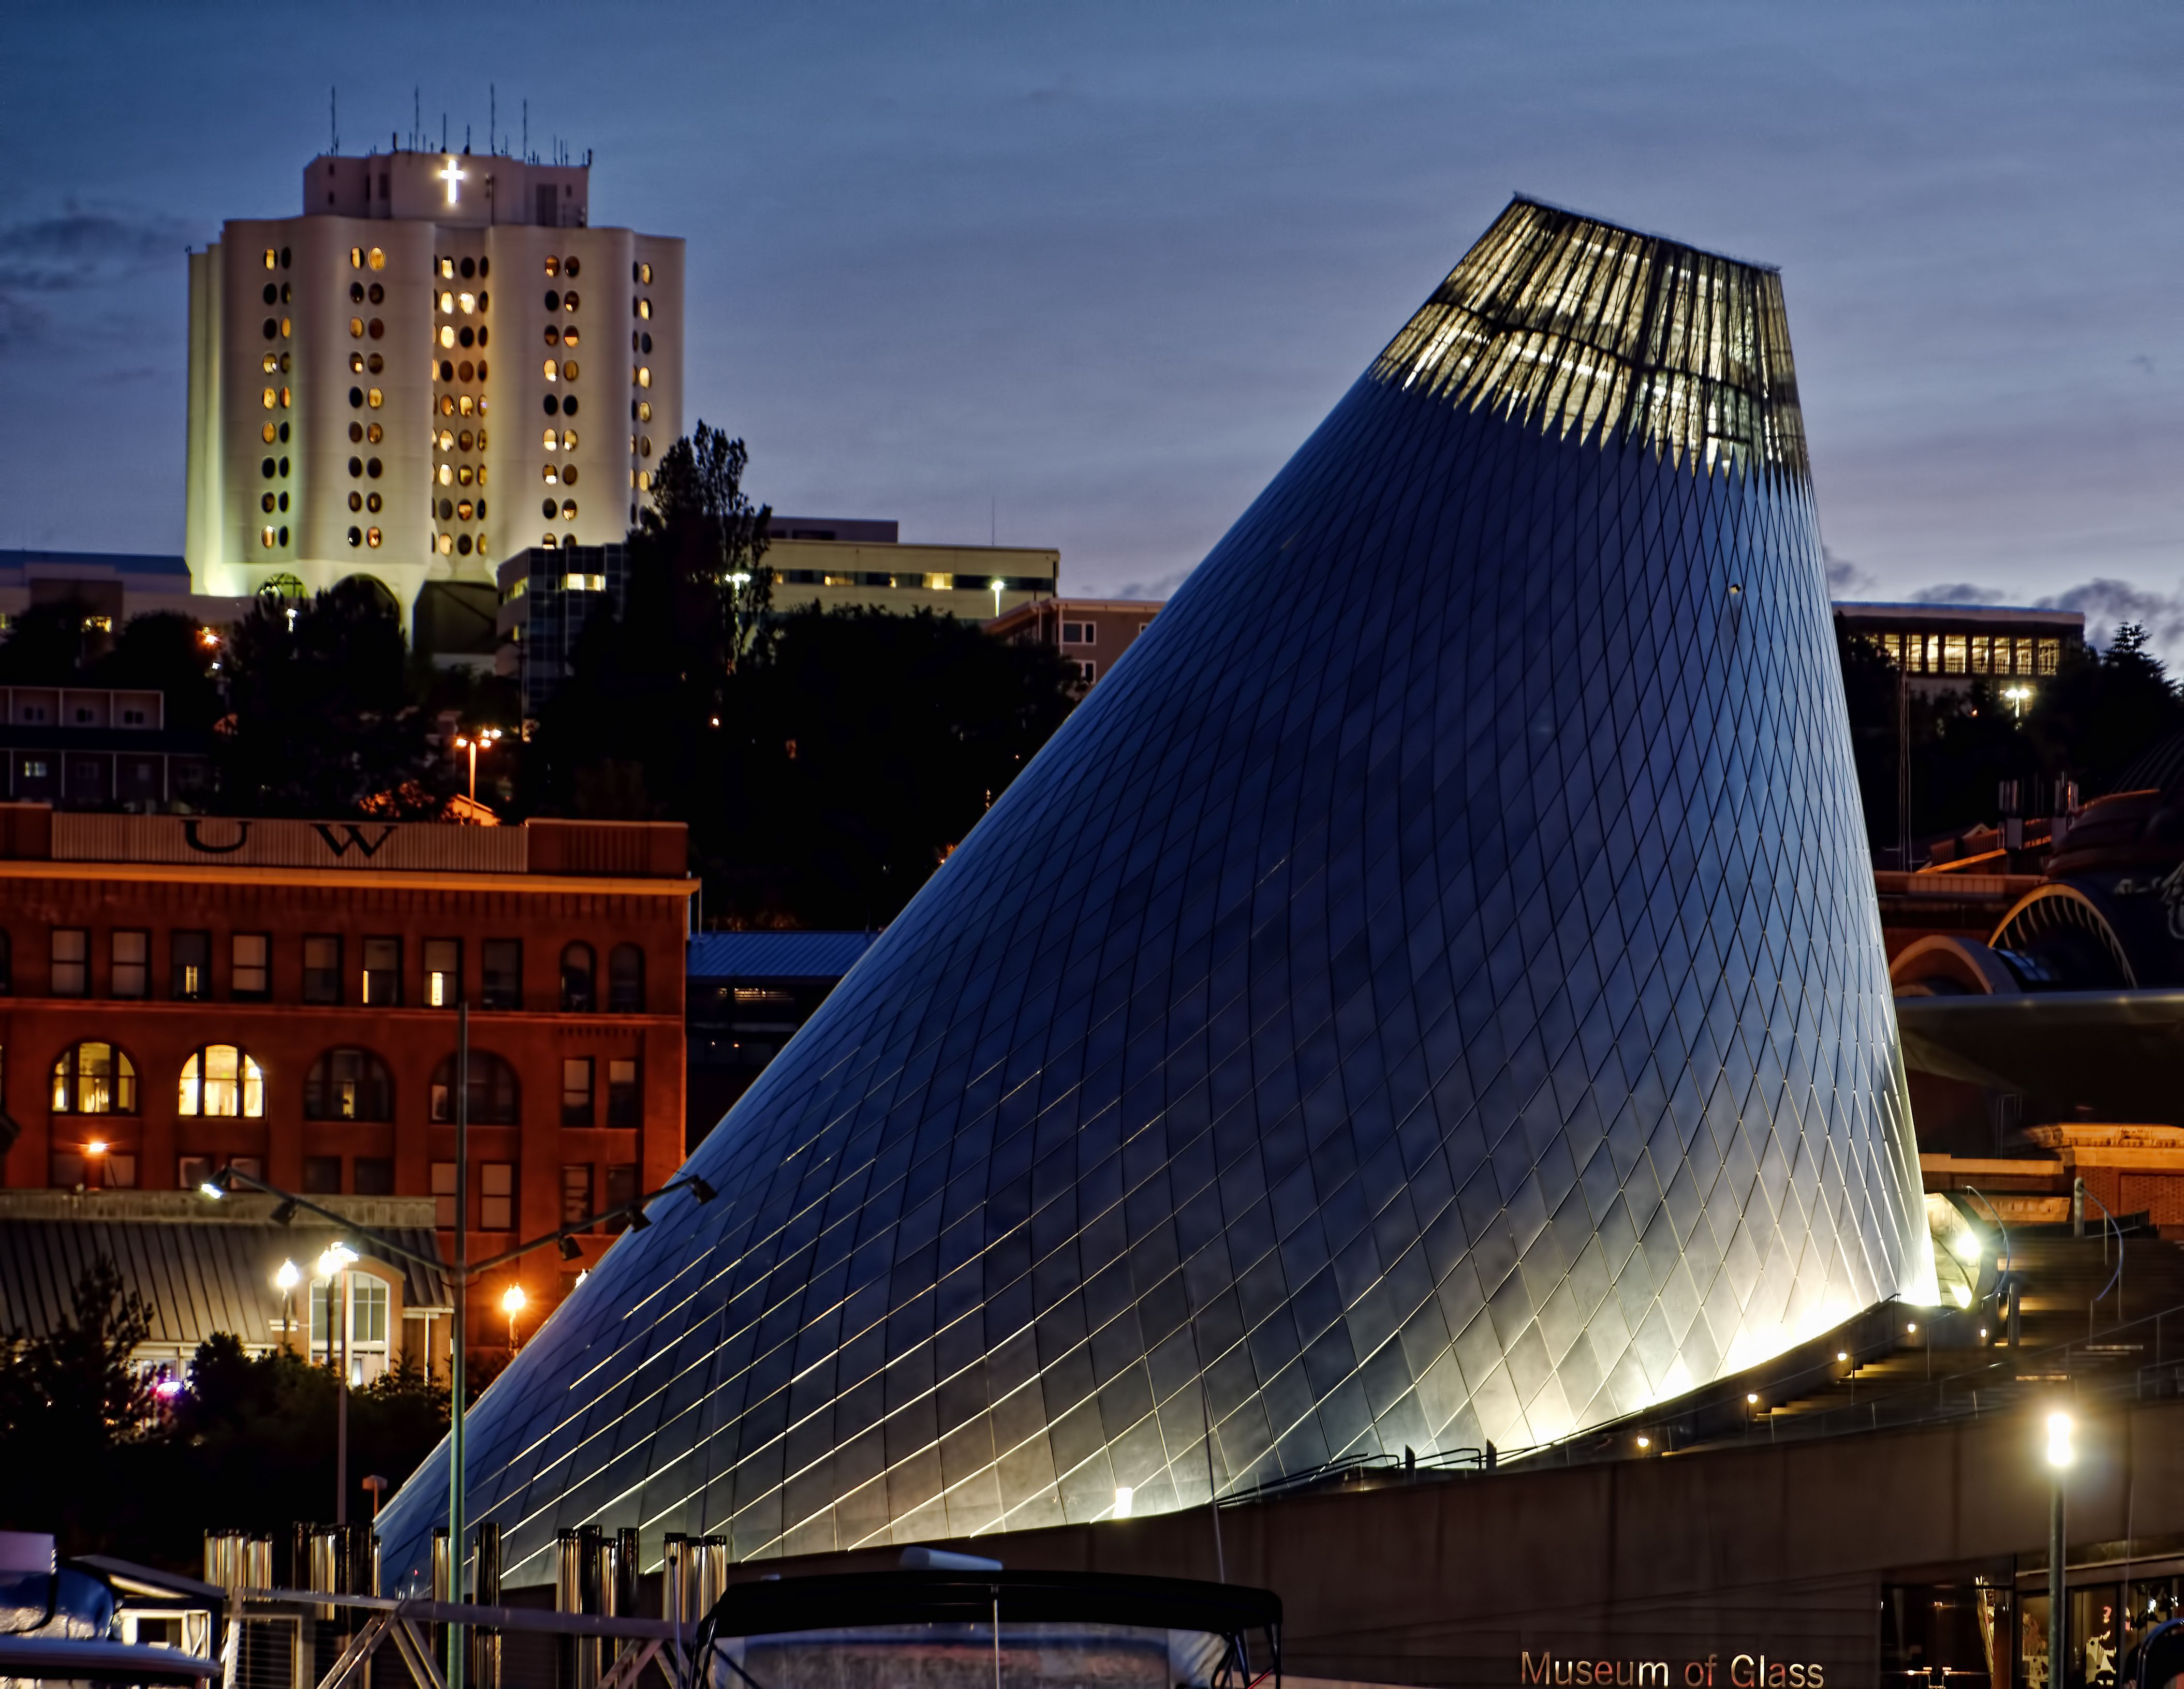 Arthur Erickson's distinctive tiled cone design for the Museum of Glass, Tacoma